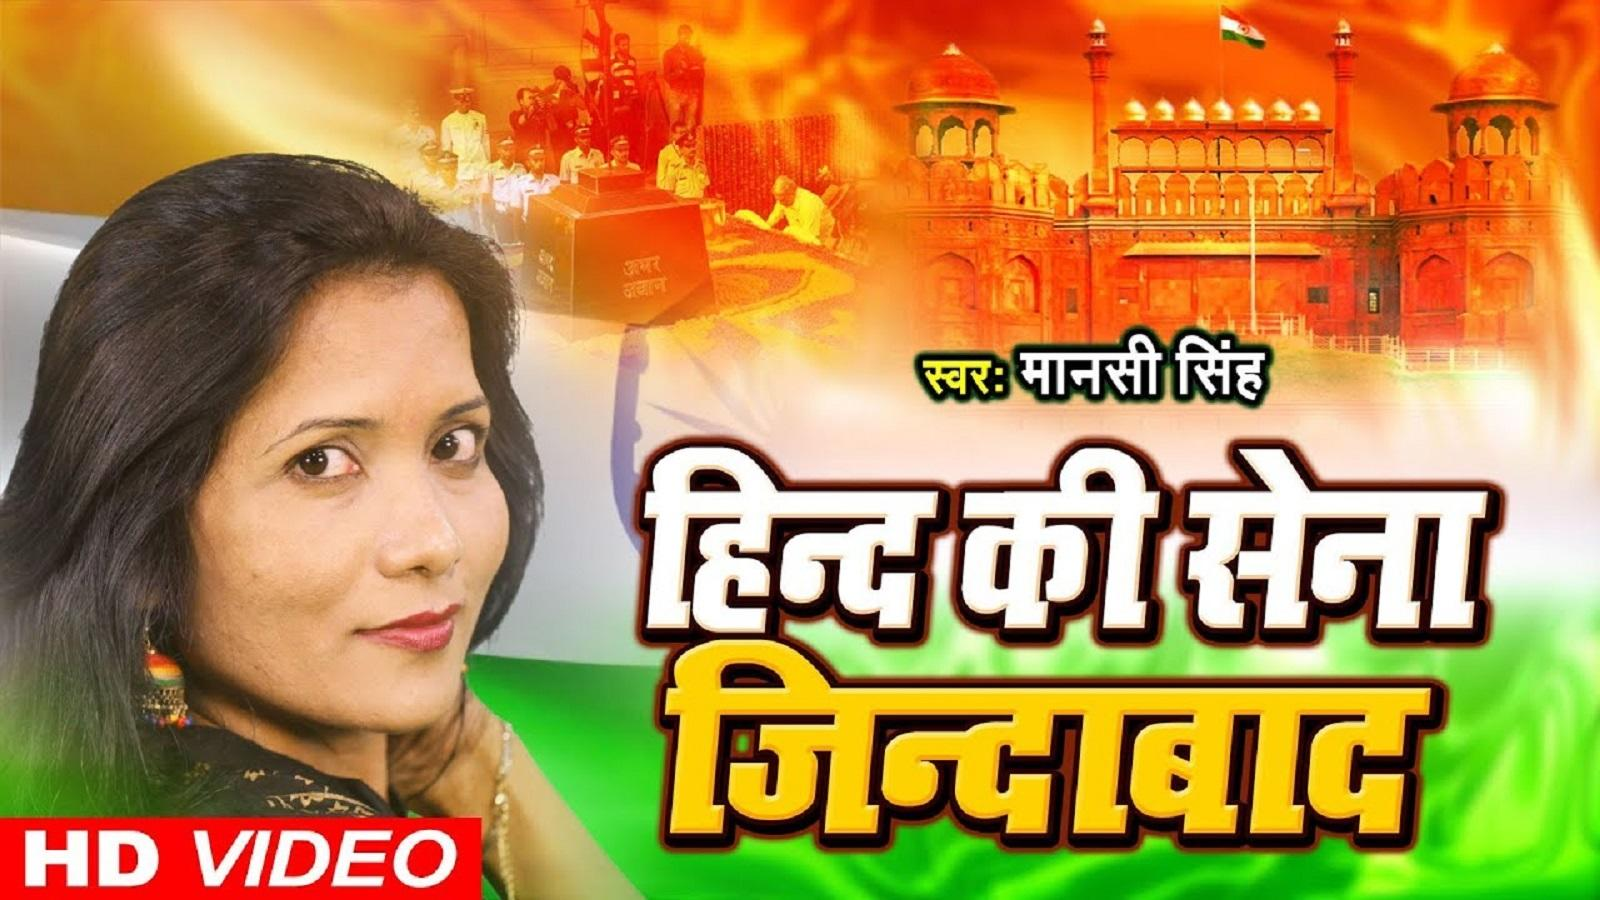 Bhojpuri Deshbhakti Video Song Independence Day 15 August 2019 Gana Latest Bhojpuri Patriotic Song Hind Desh Ke Sena Jindabaad Sung By Manshi Singh